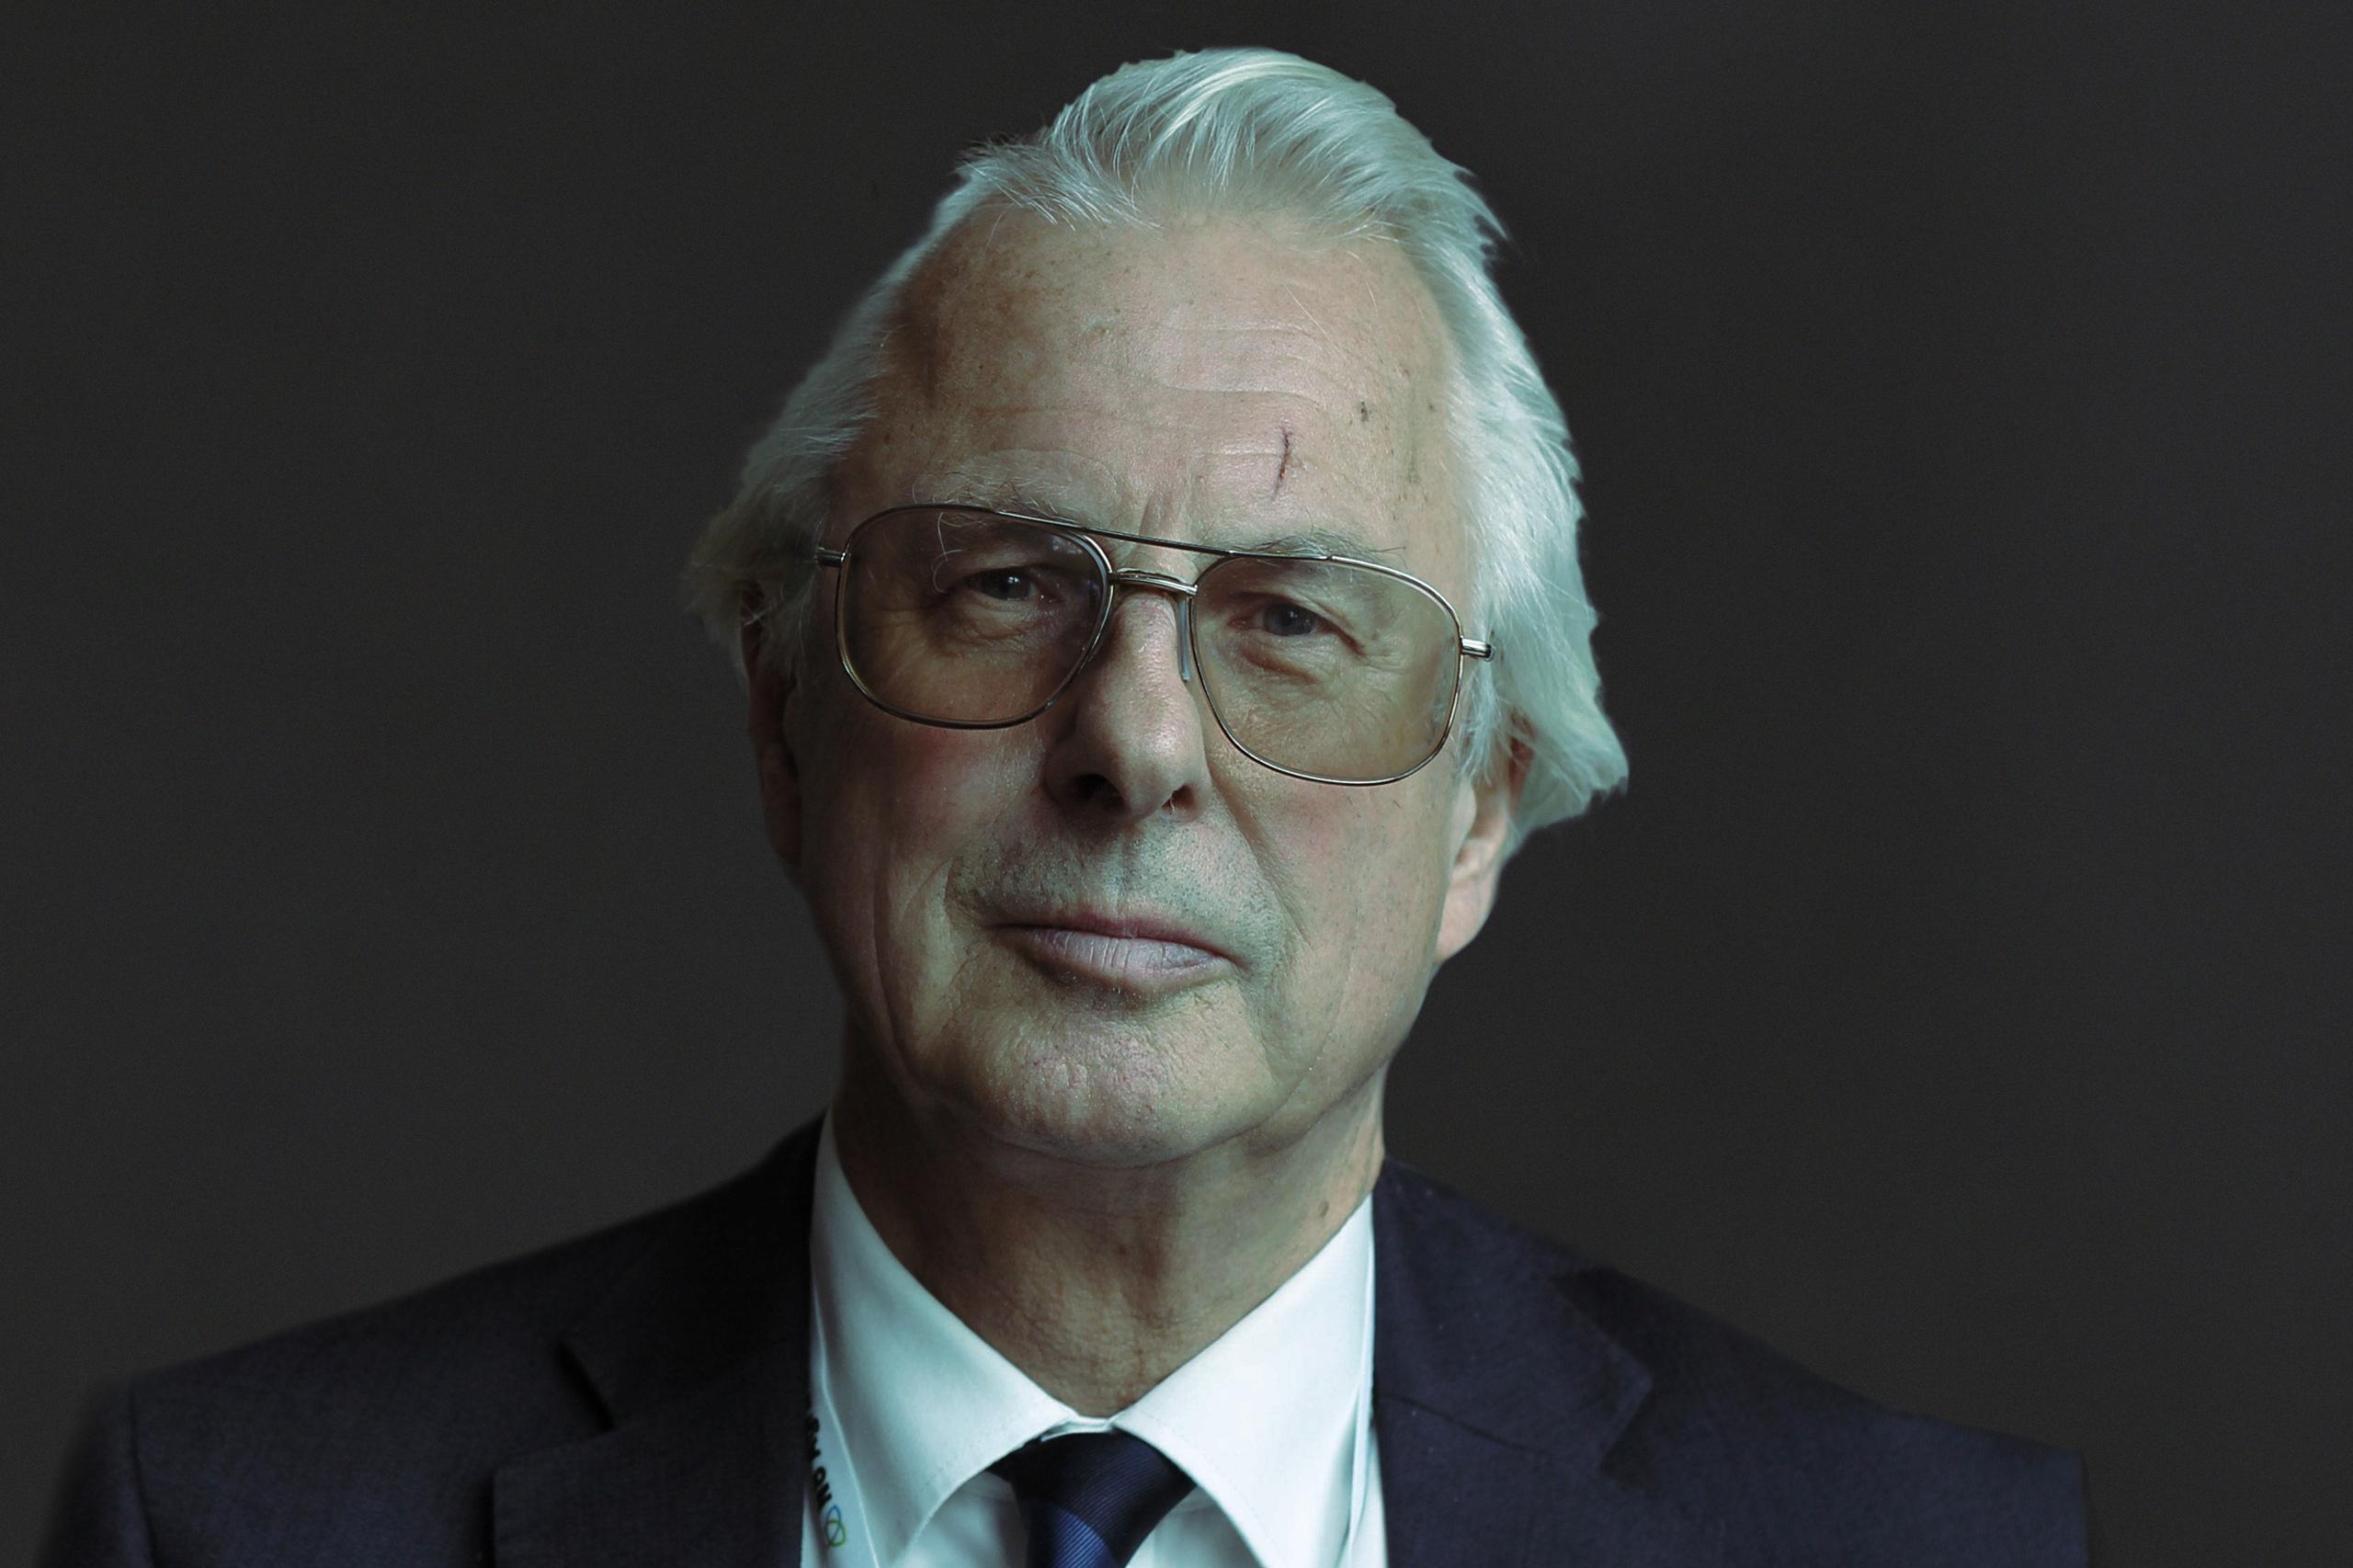 Emeritus Professor the Lord Trees - Chair